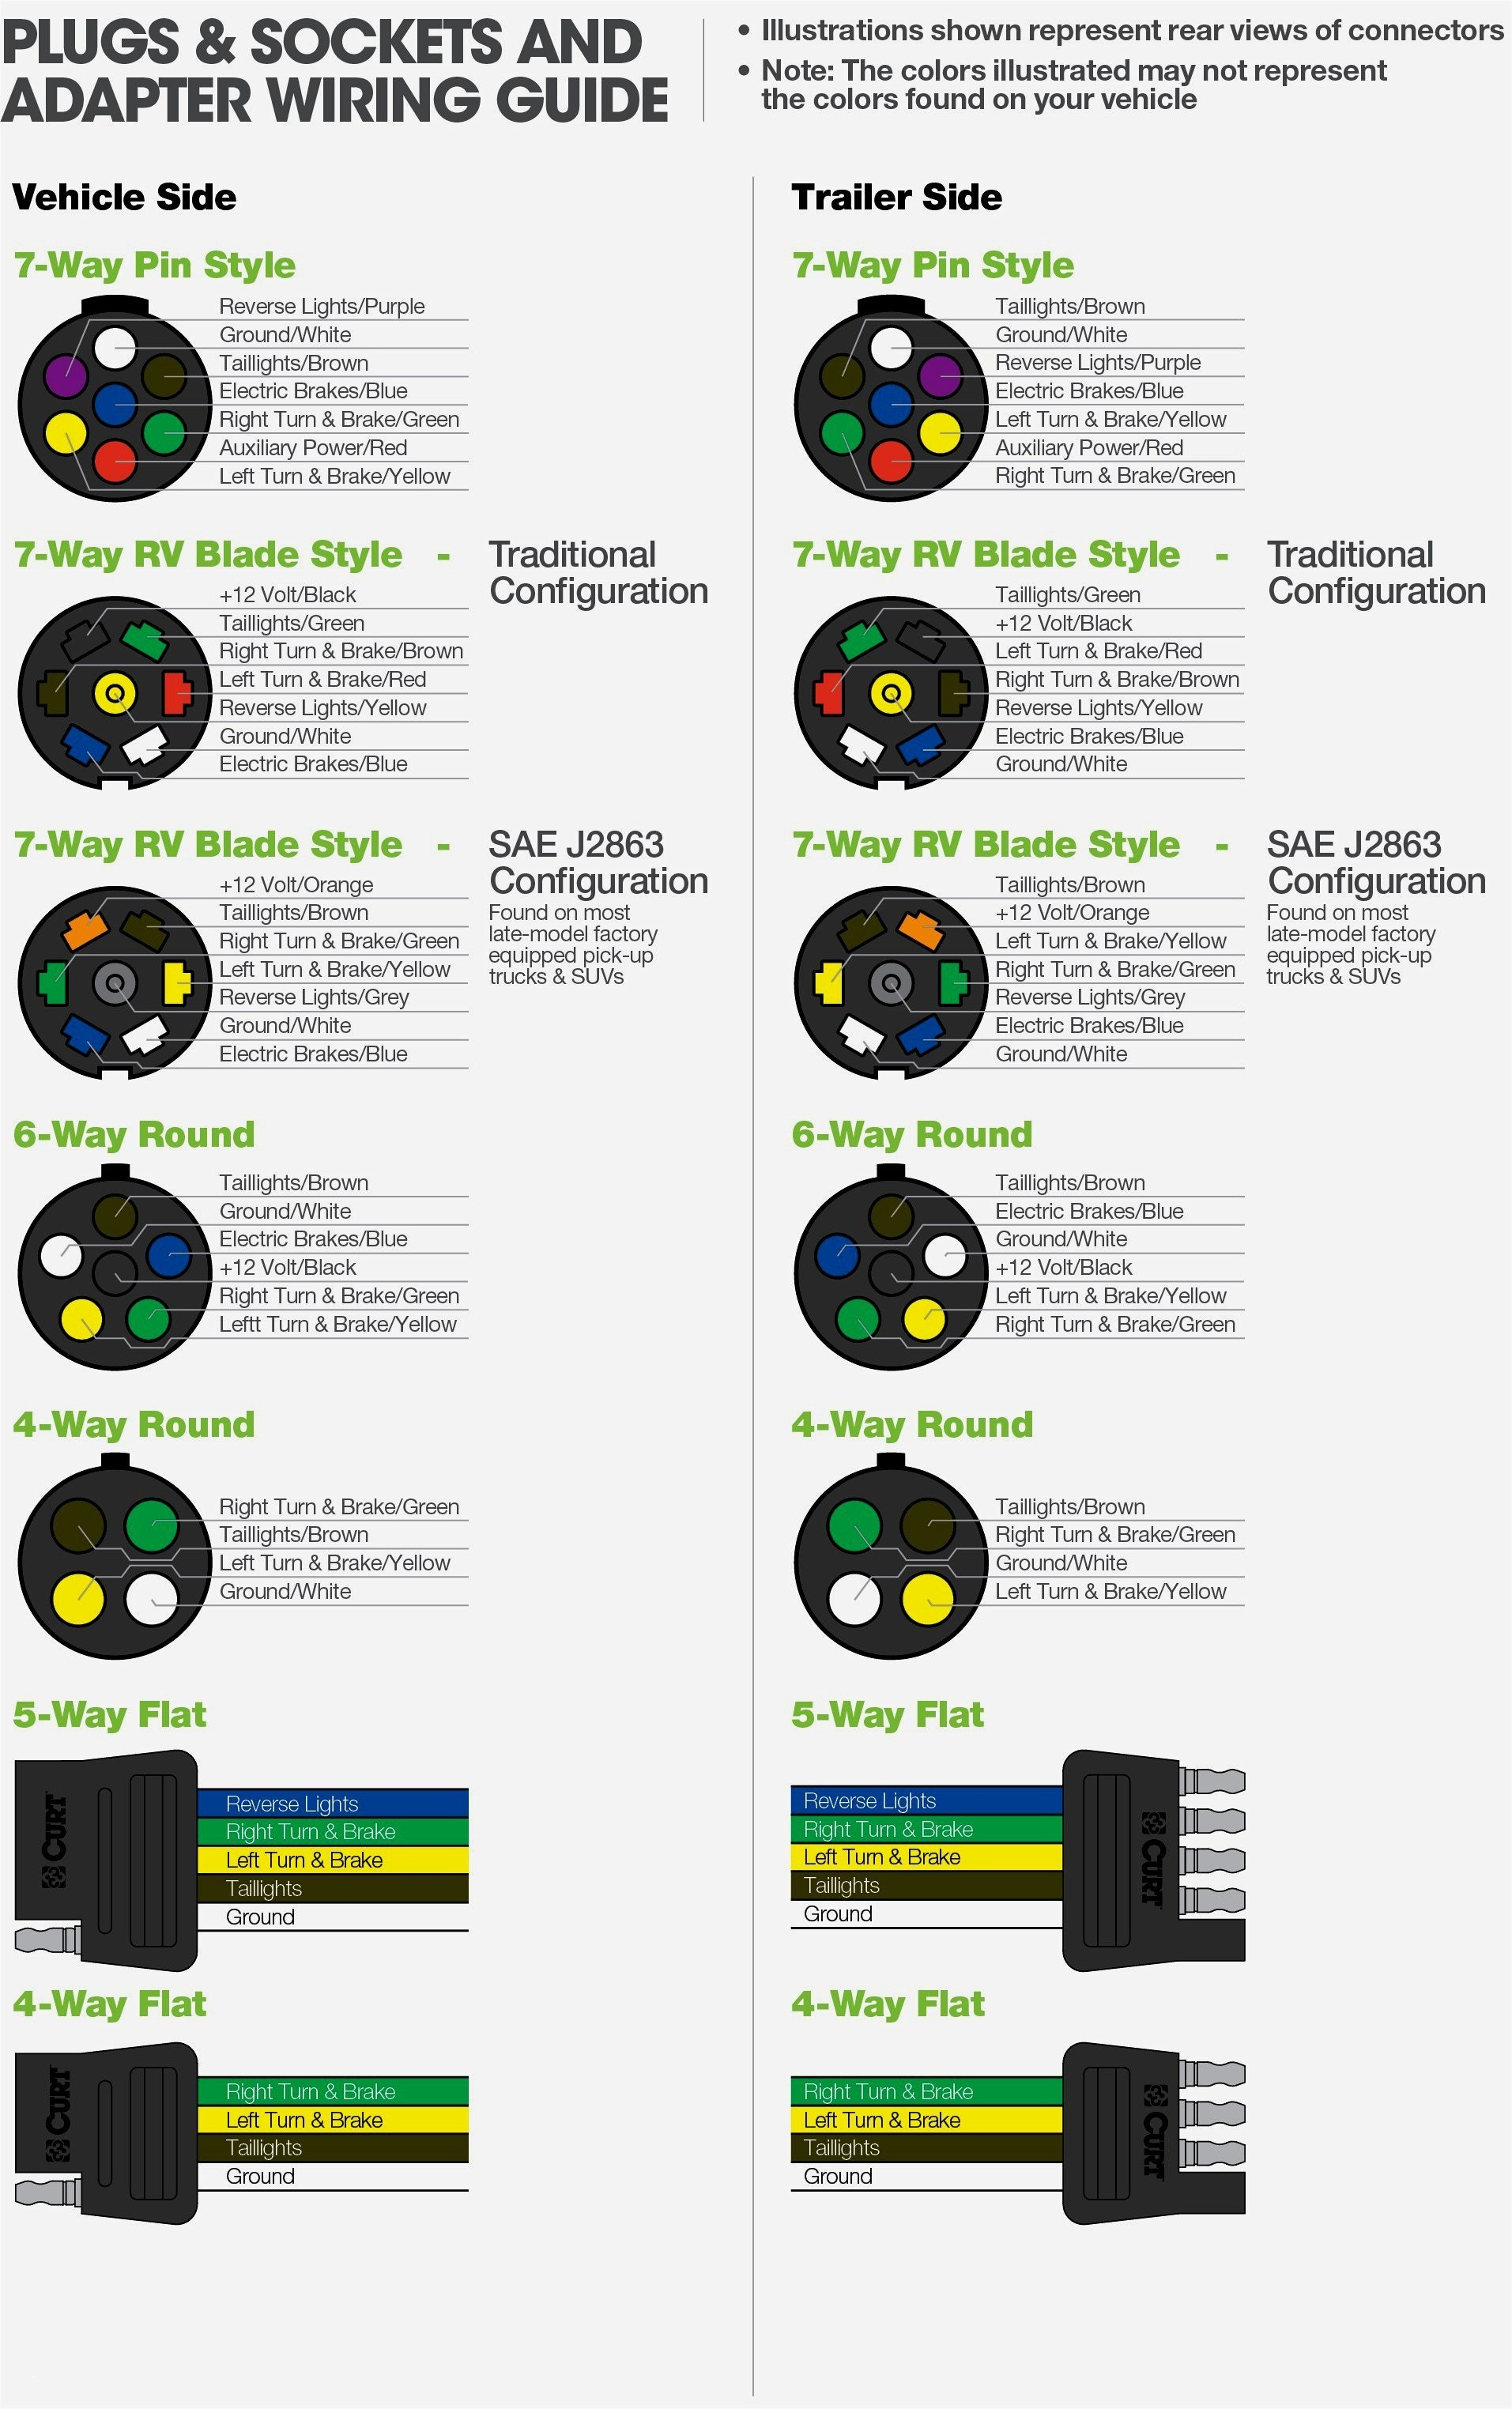 7 Pin Trailer Wiring Diagram With Brakes 7 Way Trailer Plug Wiring - 7 Prong Trailer Wiring Diagram